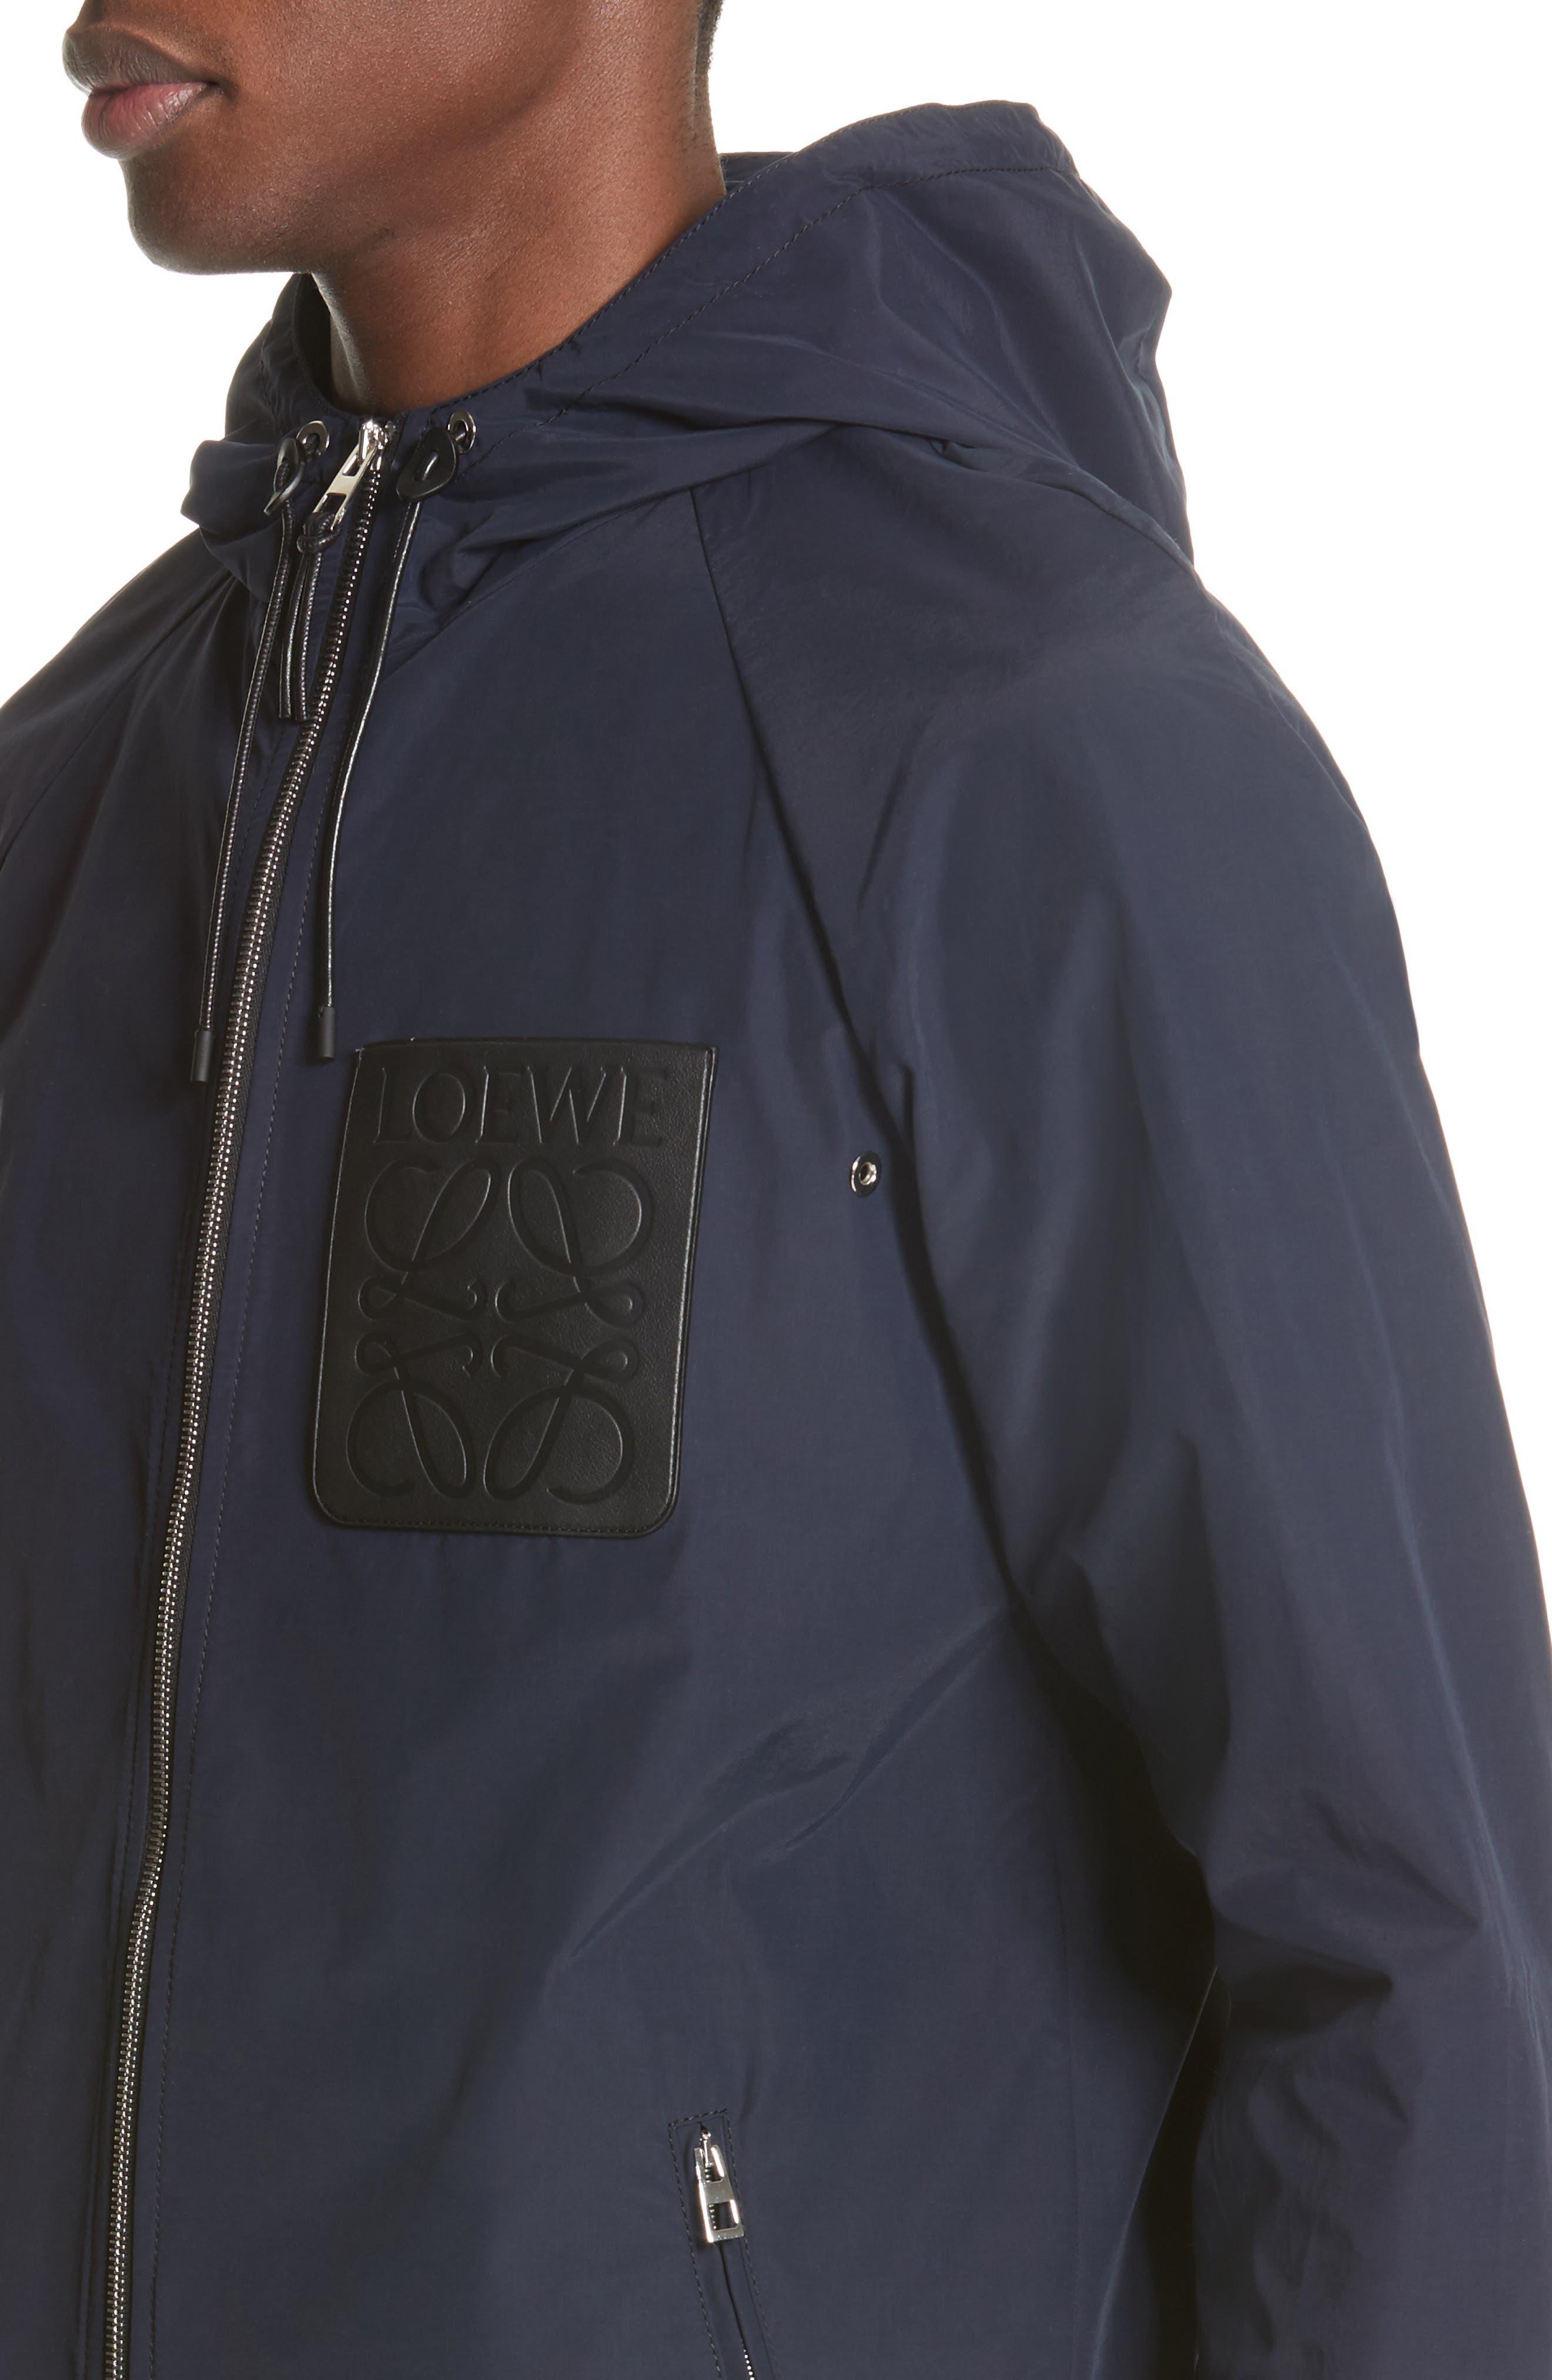 Zip Hooded Jacket,                             Alternate thumbnail 4, color,                             NAVY BLUE